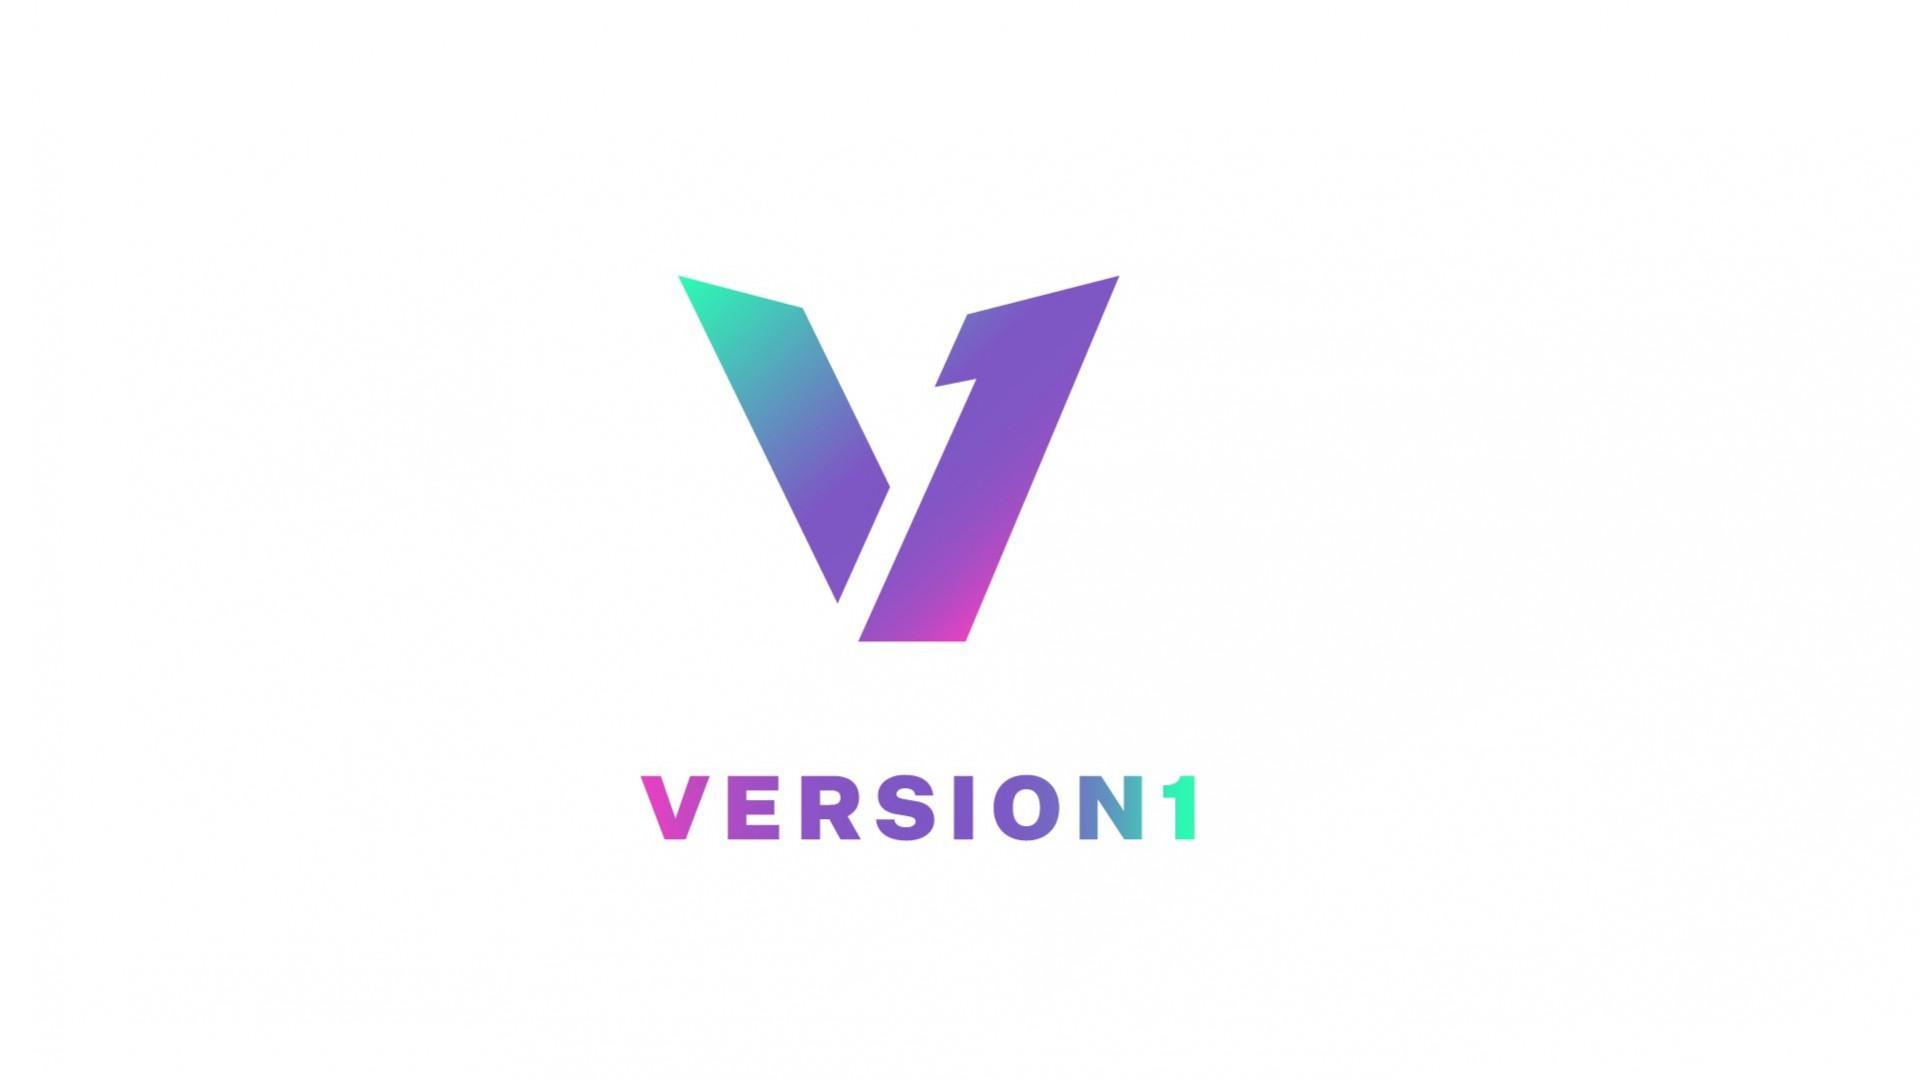 Version1 Rebrand 2021